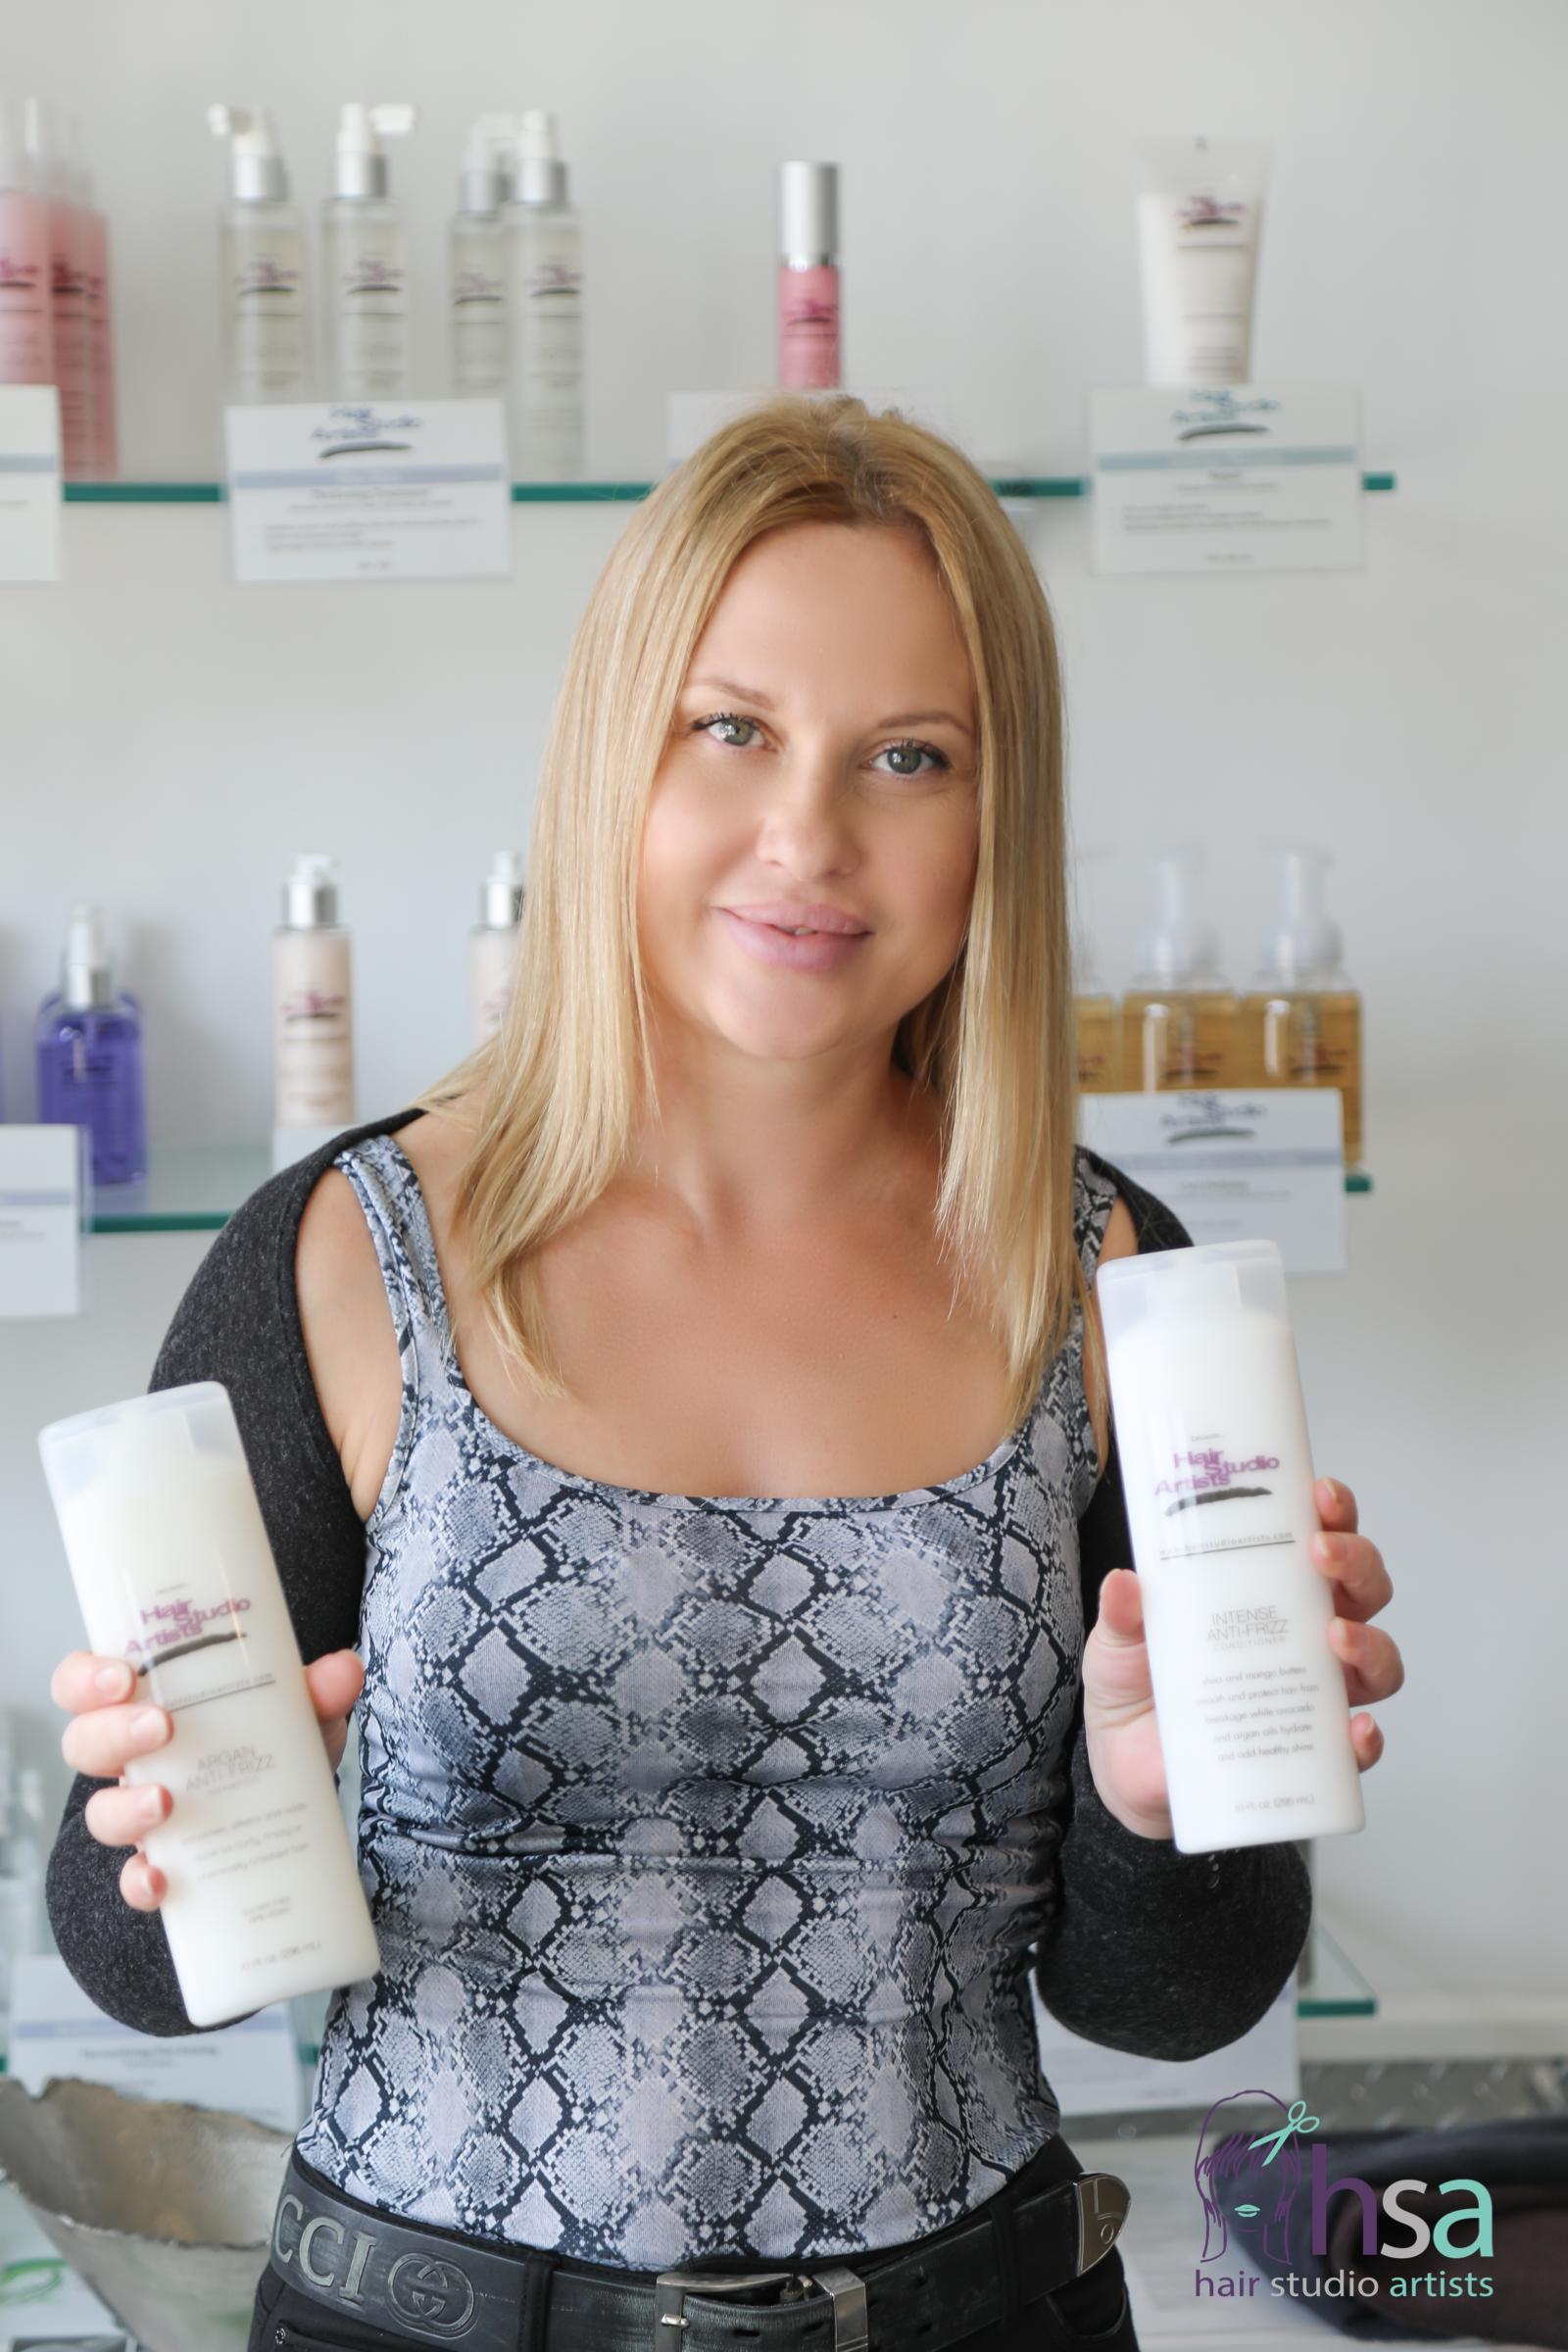 hair product clipper cuts highlights balayage salon color cut